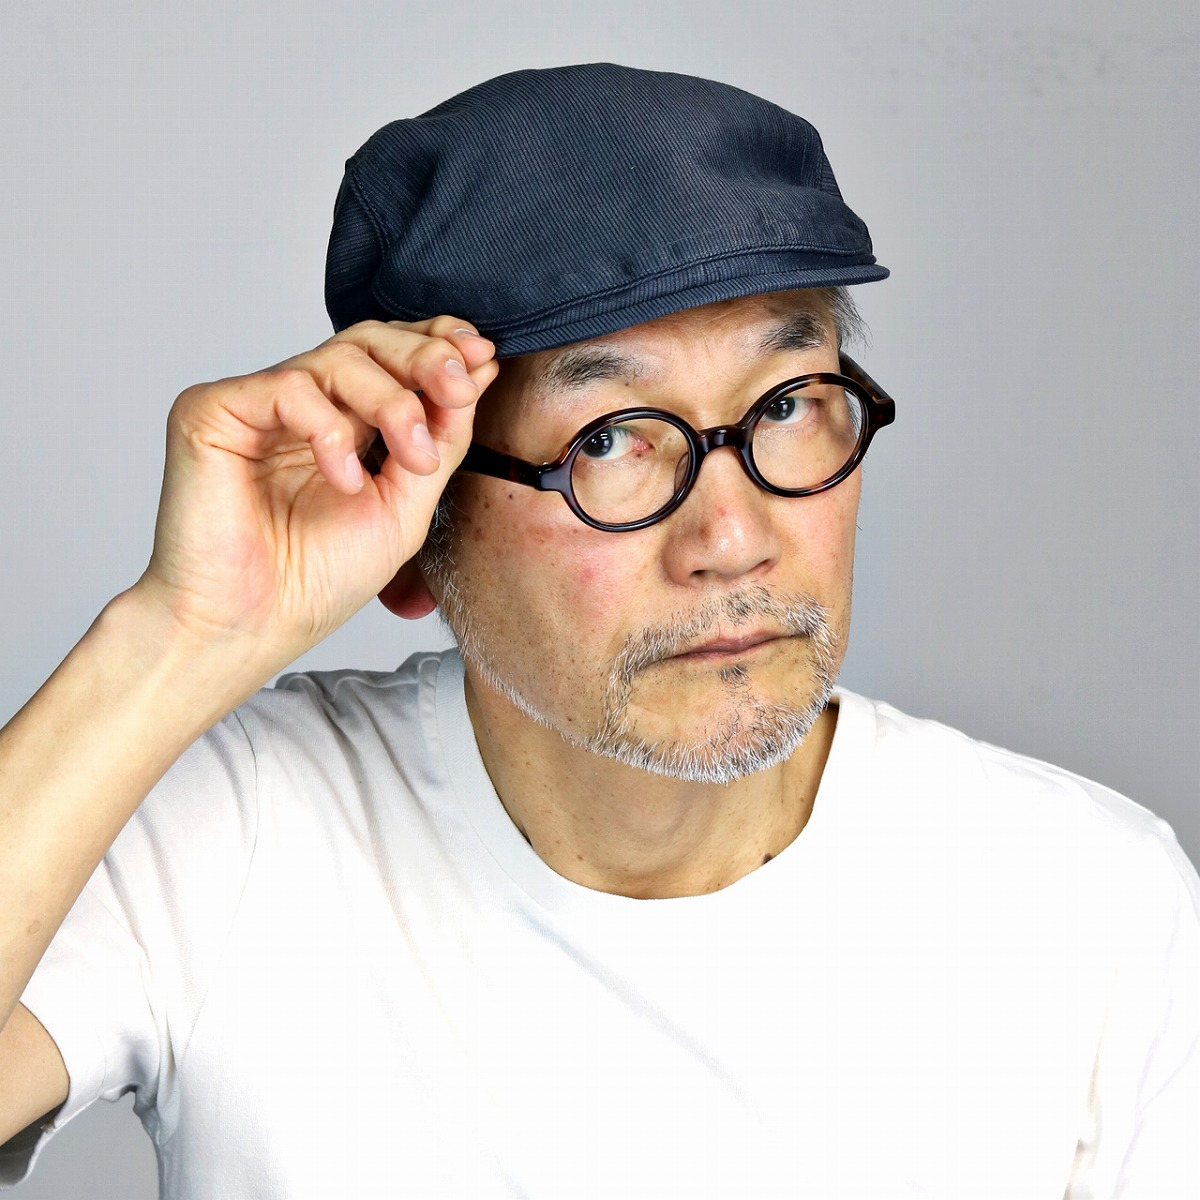 1c881e0ea2b Size size adjustment hat brand   dark blue navy  ivy cap  where Shin pull  moisture absorption fast-dry Lamy hemp S M L LL hunting cap is big in Mila  Schon ...